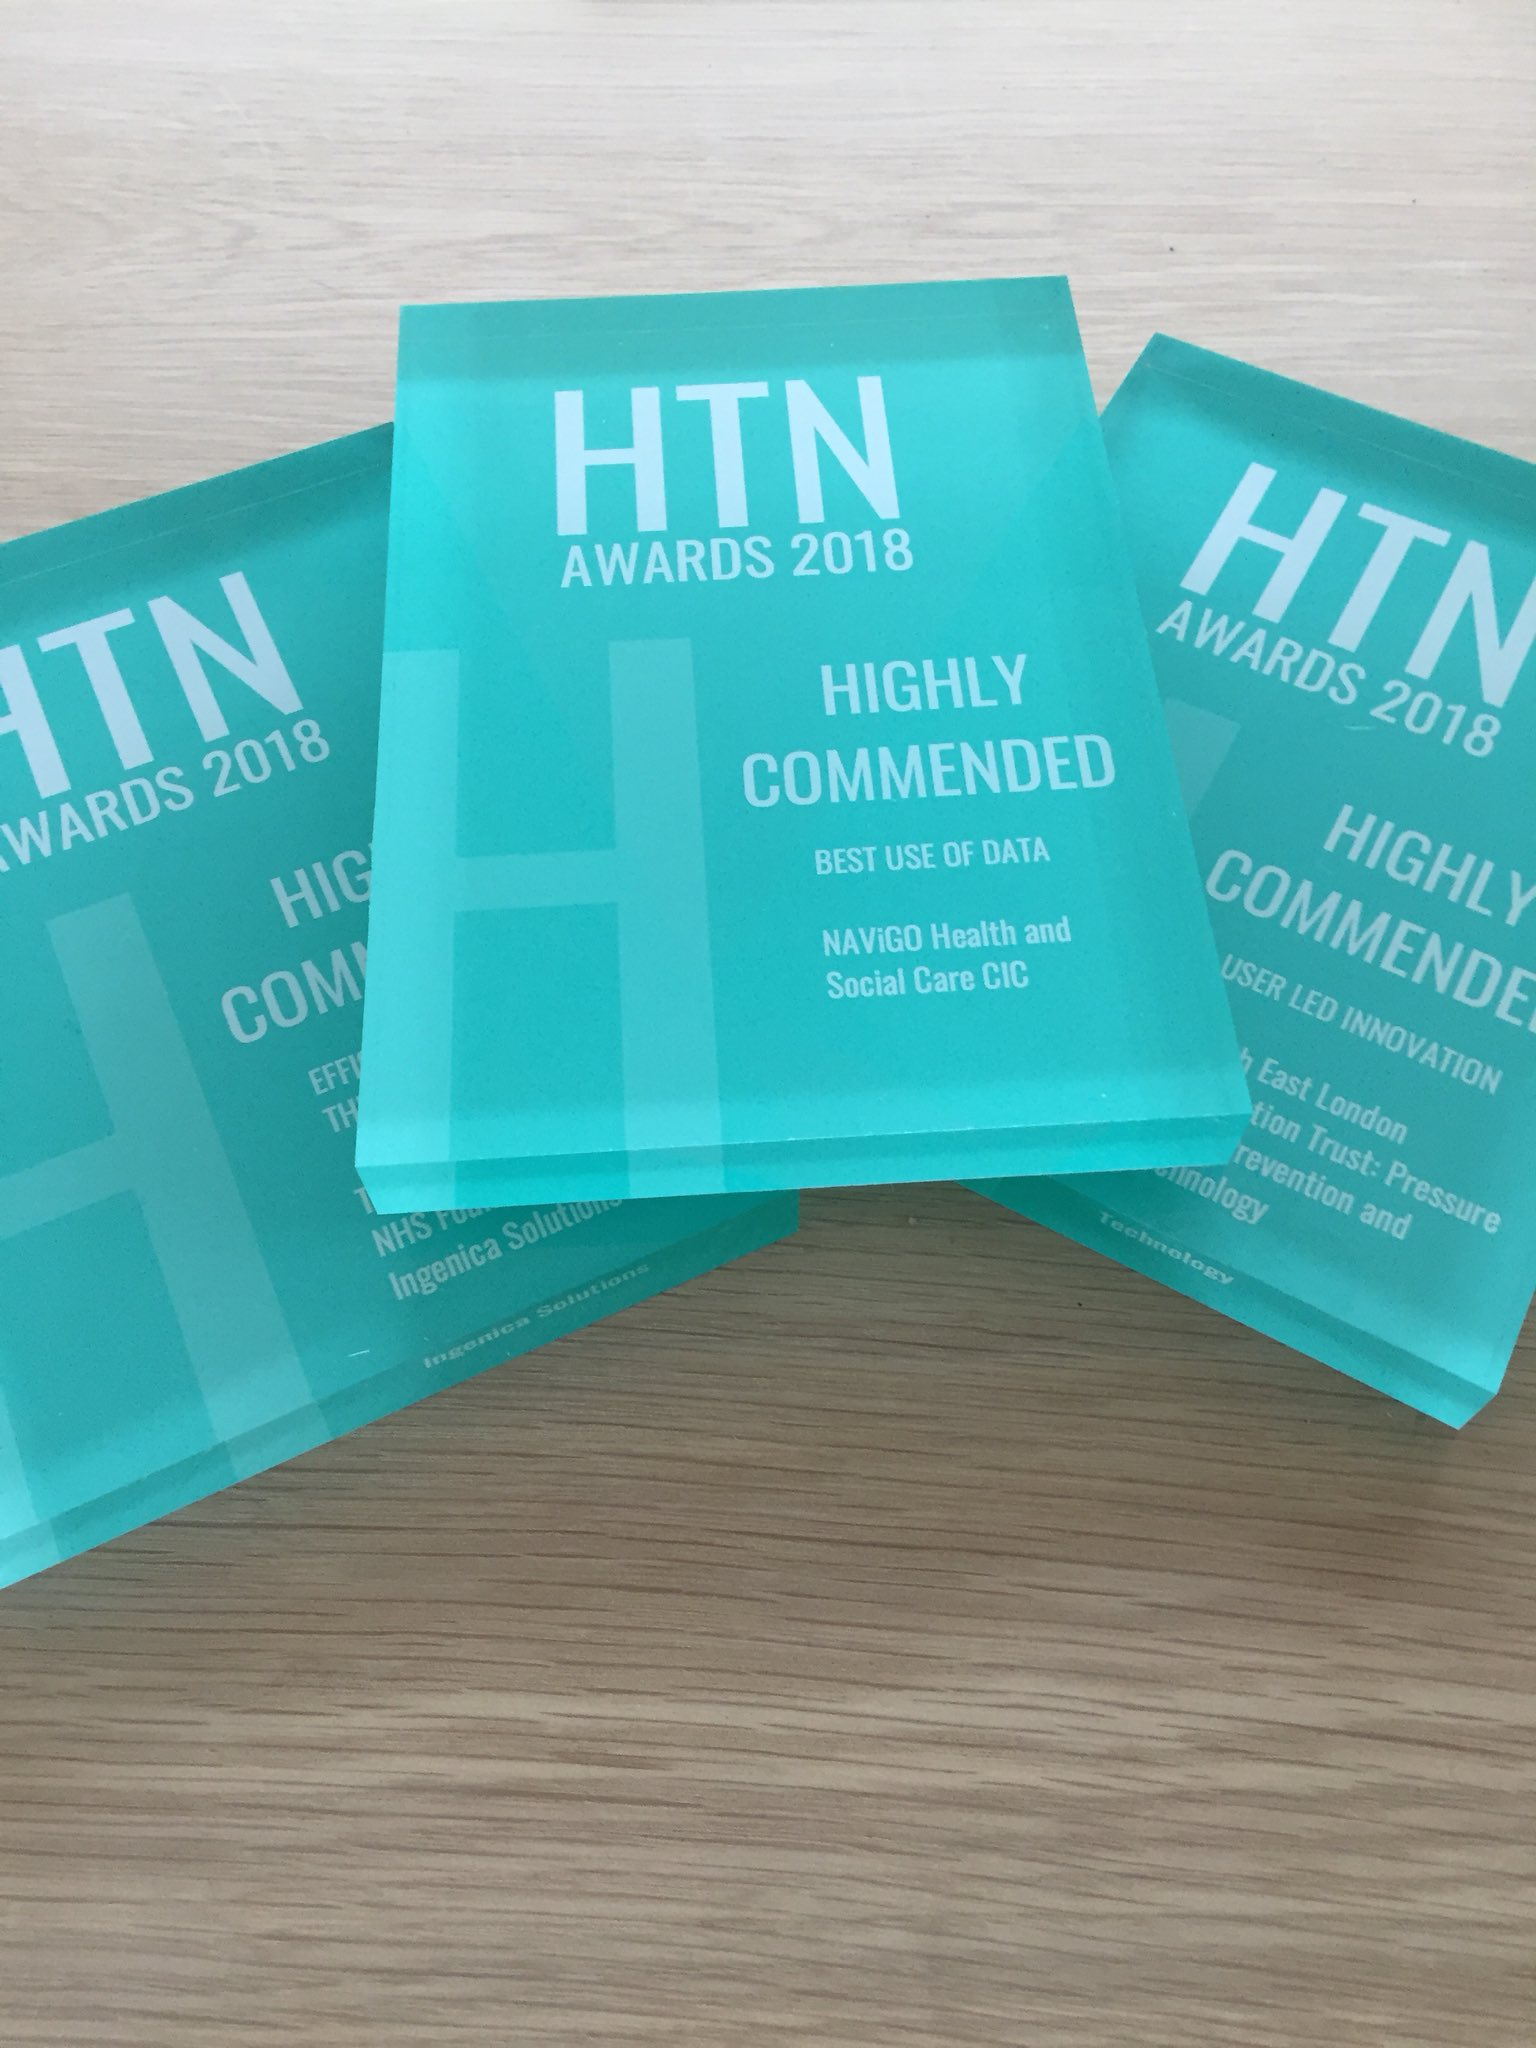 Health Tech Awards 2019 - htn